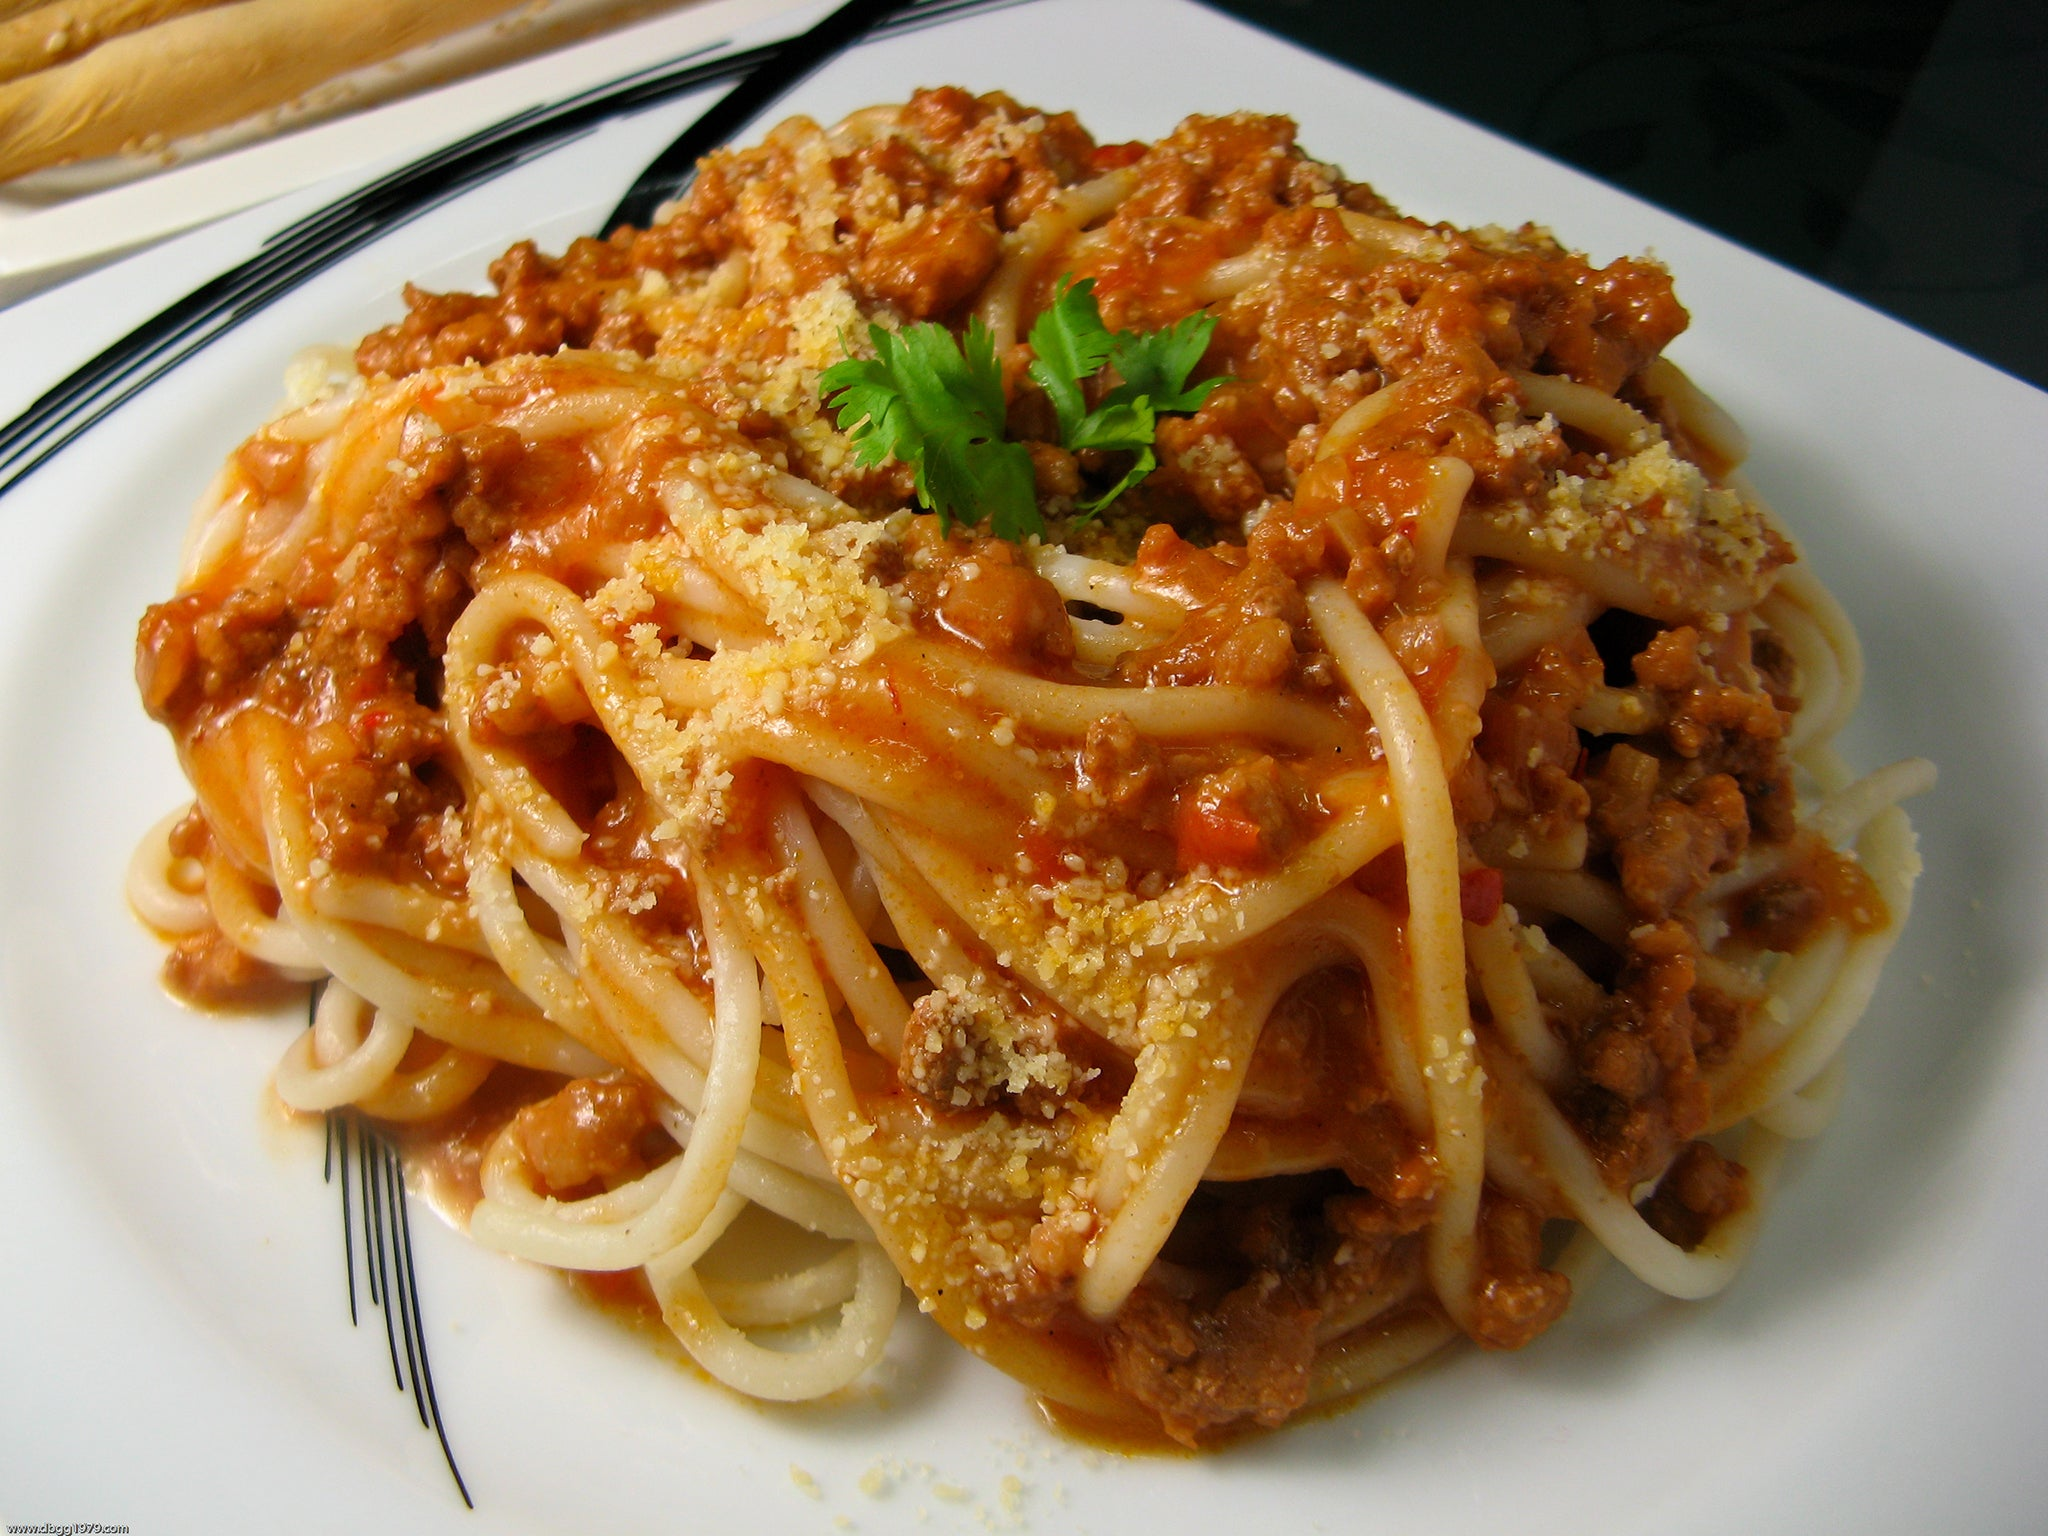 Does Reheating Pasta Make It Healthier New Study SaysYes